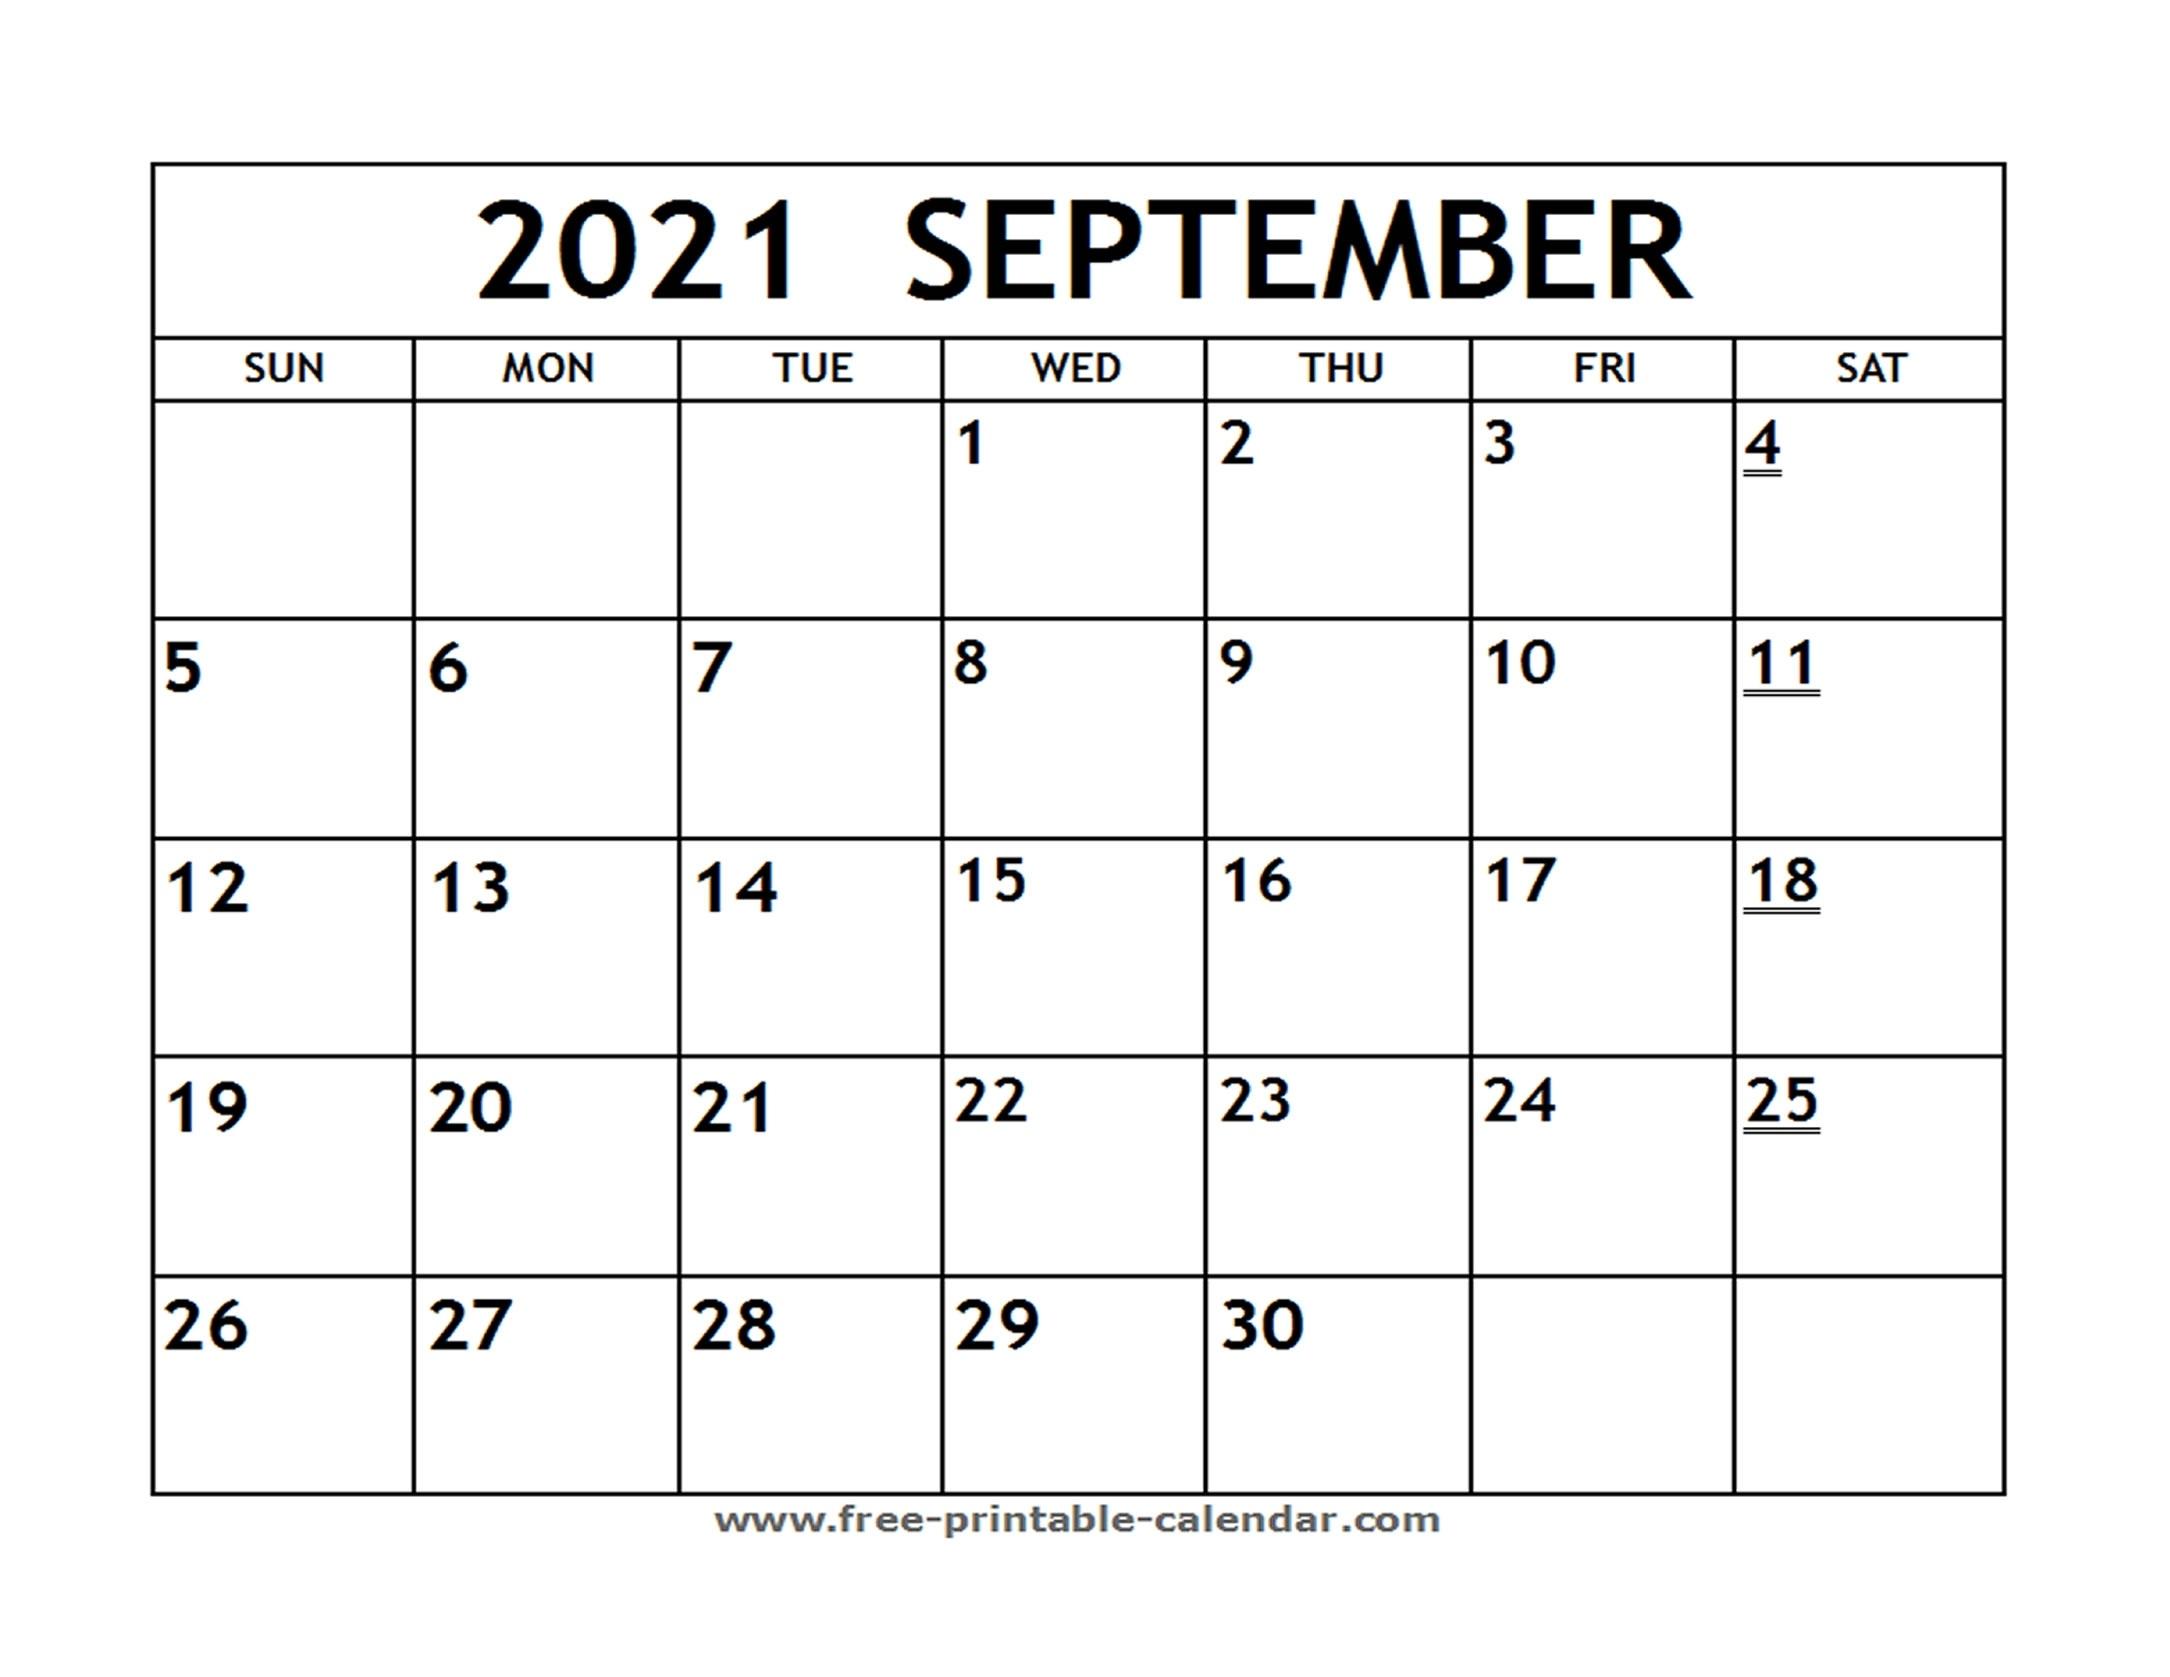 Printable 2021 September Calendar - Free-Printable-Calendar September 2021 Calendar Template